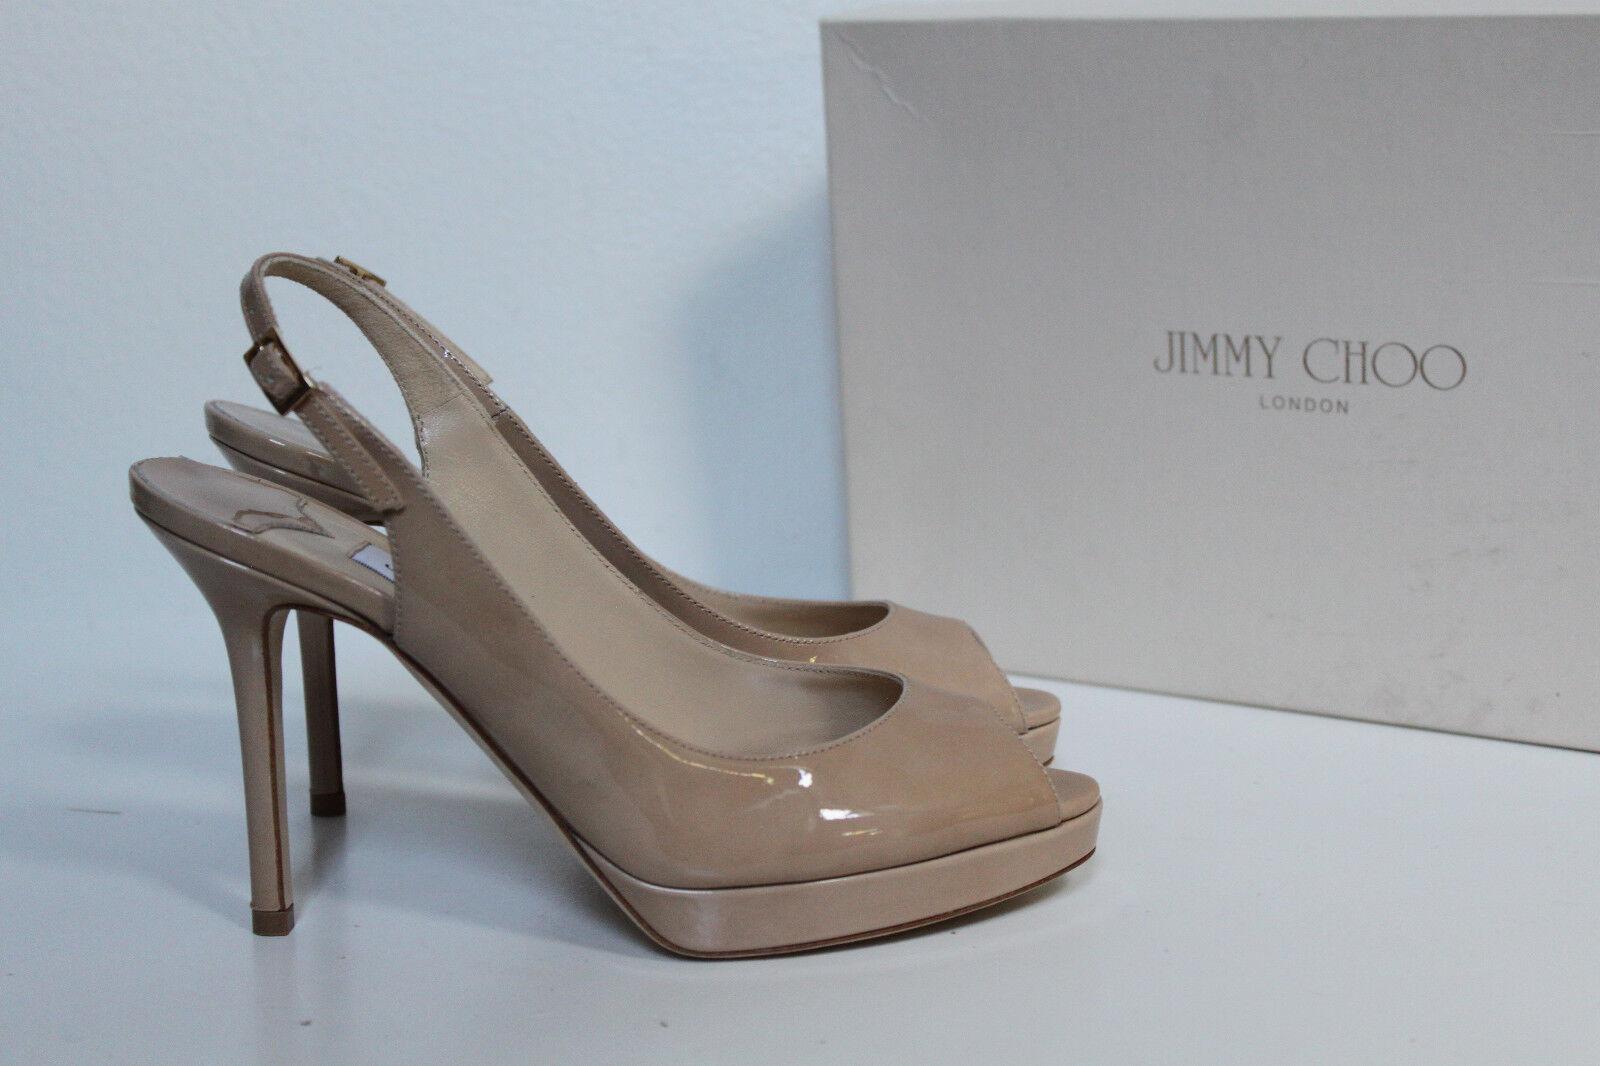 Sito ufficiale Sz 6.5 6.5 6.5   36.5 Jimmy Choo Nova Nude Patent Peep Toe Slingback Pump Sandals scarpe  grandi offerte